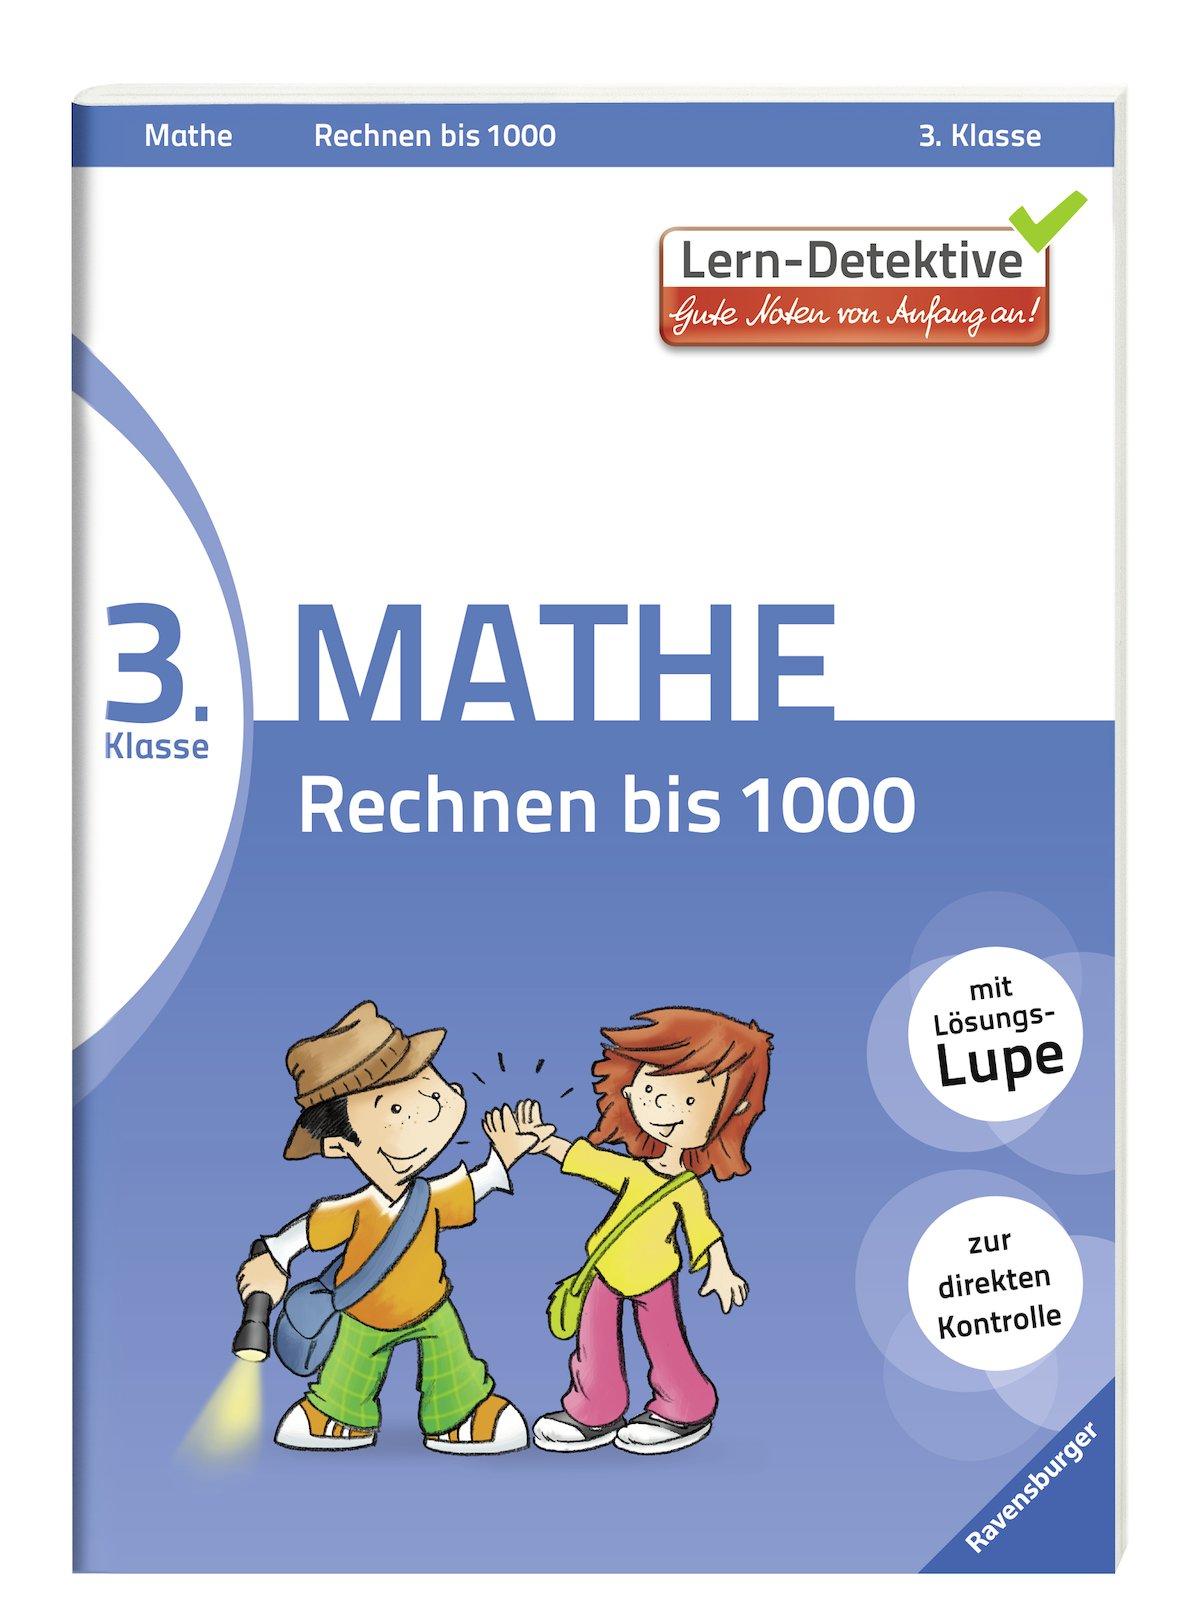 Rechnen bis 1000 (Mathe 3. Klasse) (Lern-Detektive): Amazon.de ...